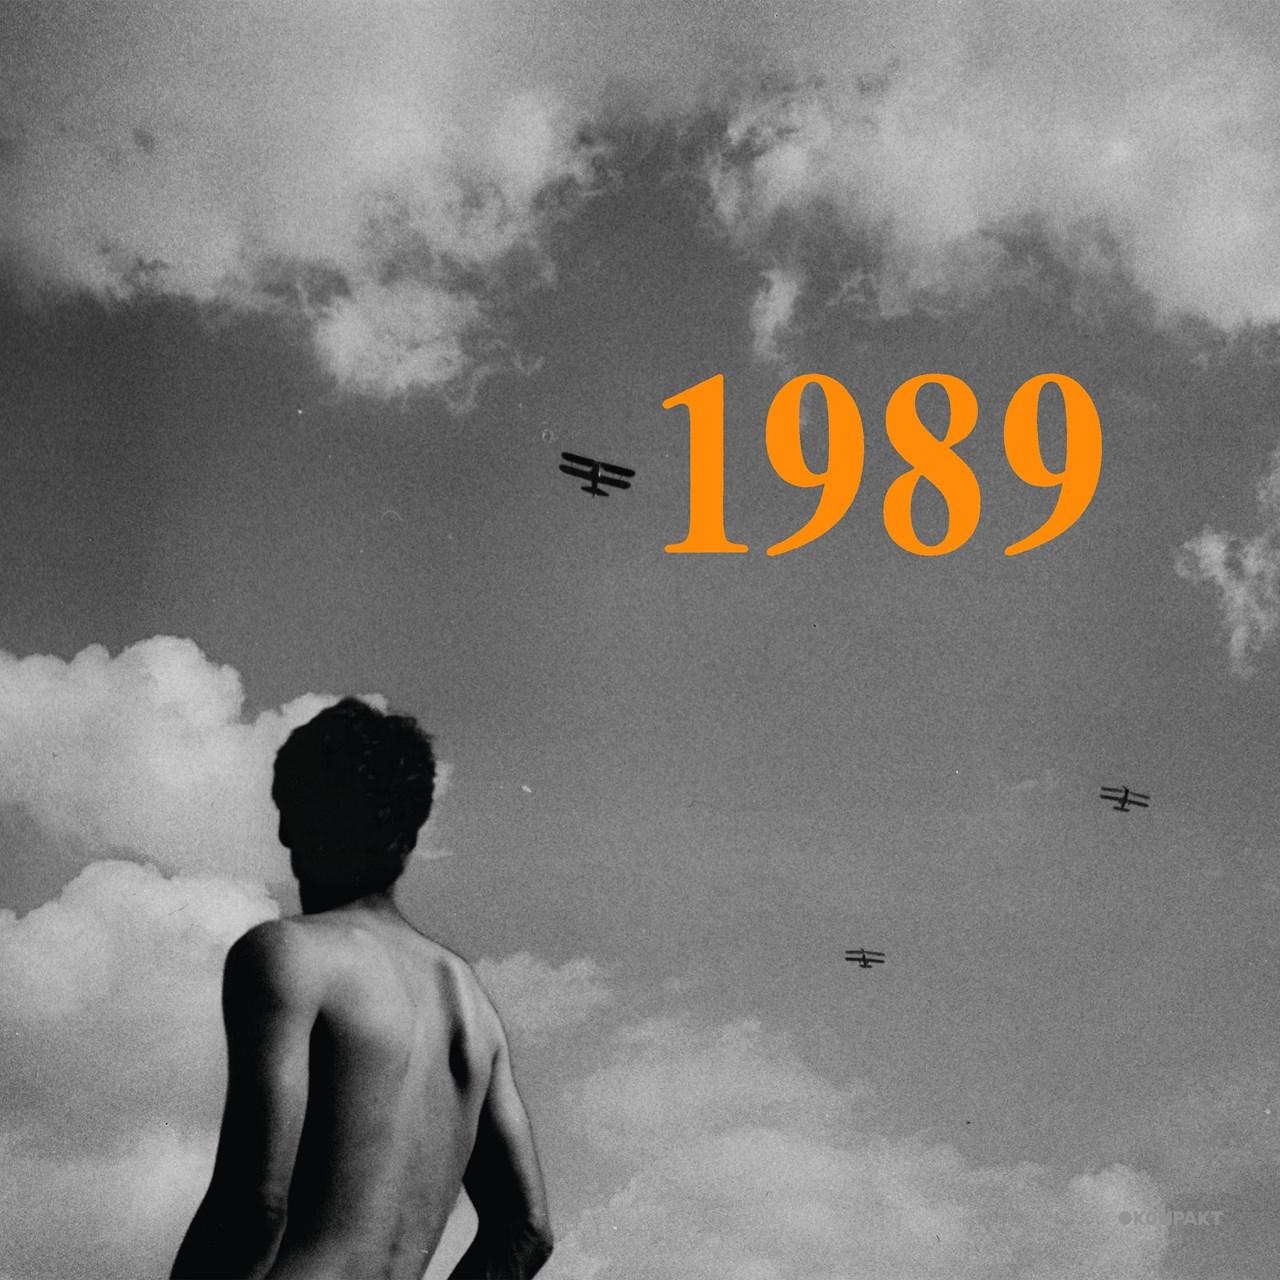 1989 - 1